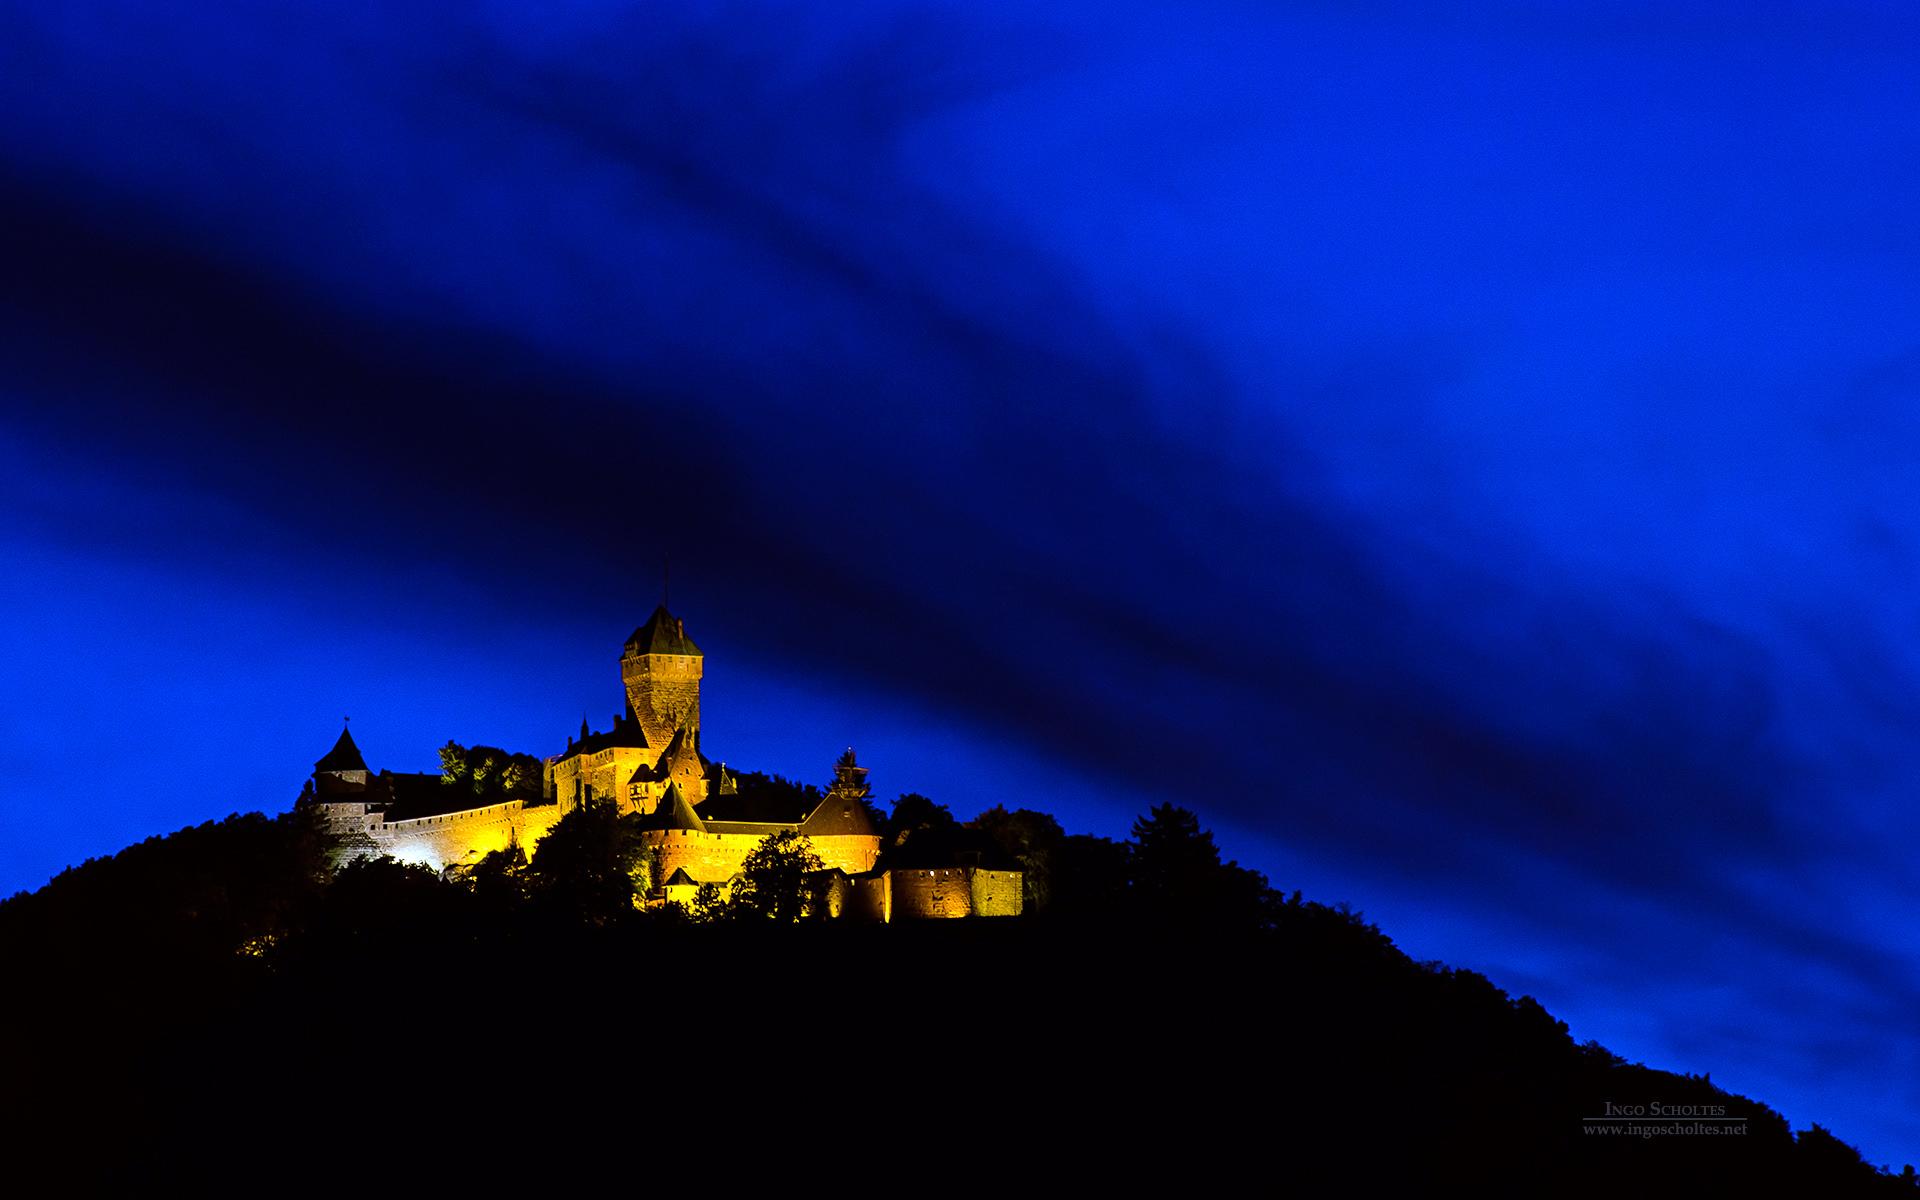 Château du Haut-K½nigsbourg, Alsace, France